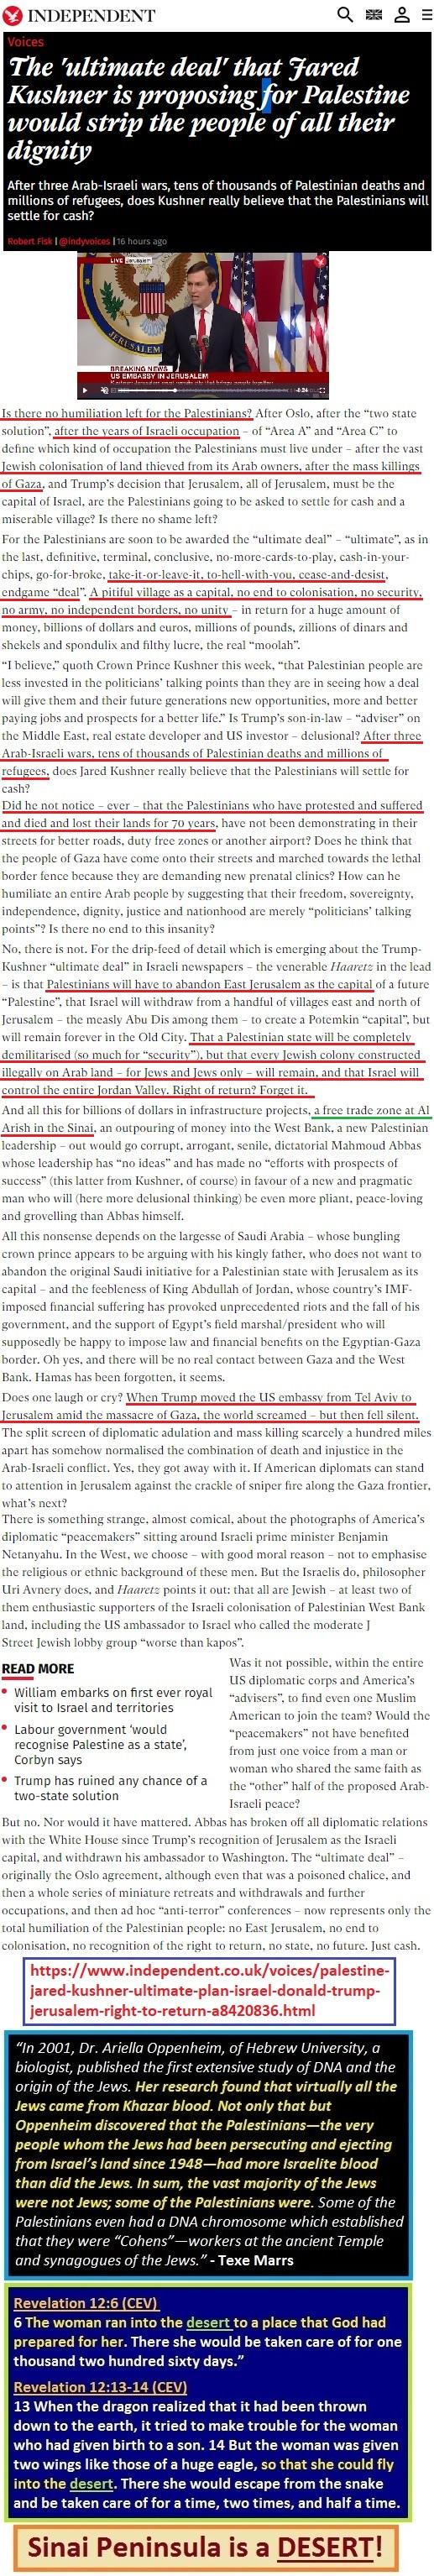 https://www.independent.co.uk/voices/palestine-jared-kushner-ultimate-plan-israel-donald-trump-jerusalem-right-to-return-a8420836.html